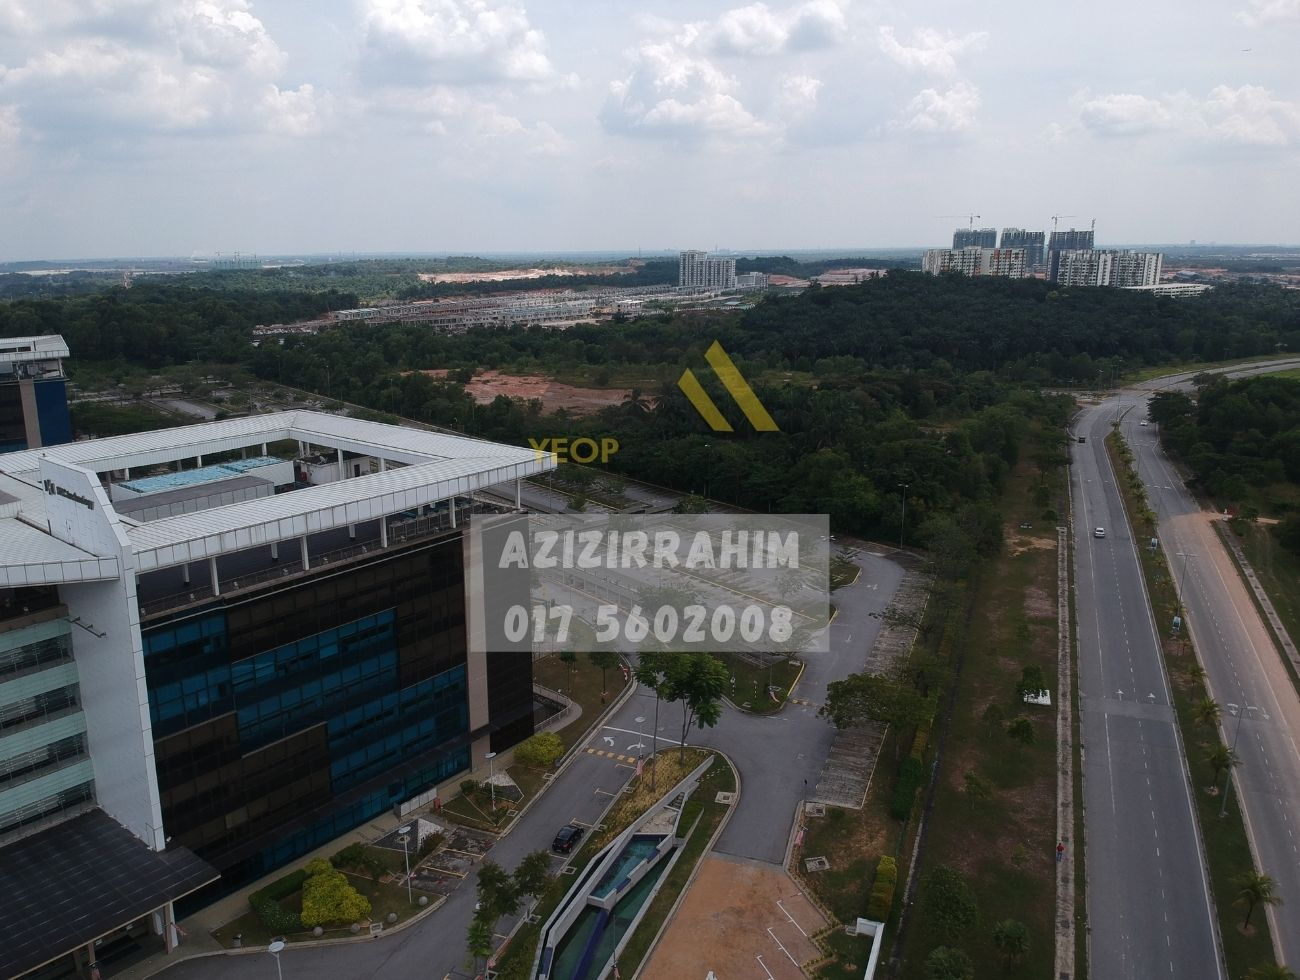 medium horizontal azizirrahim - 0175602008 (2)